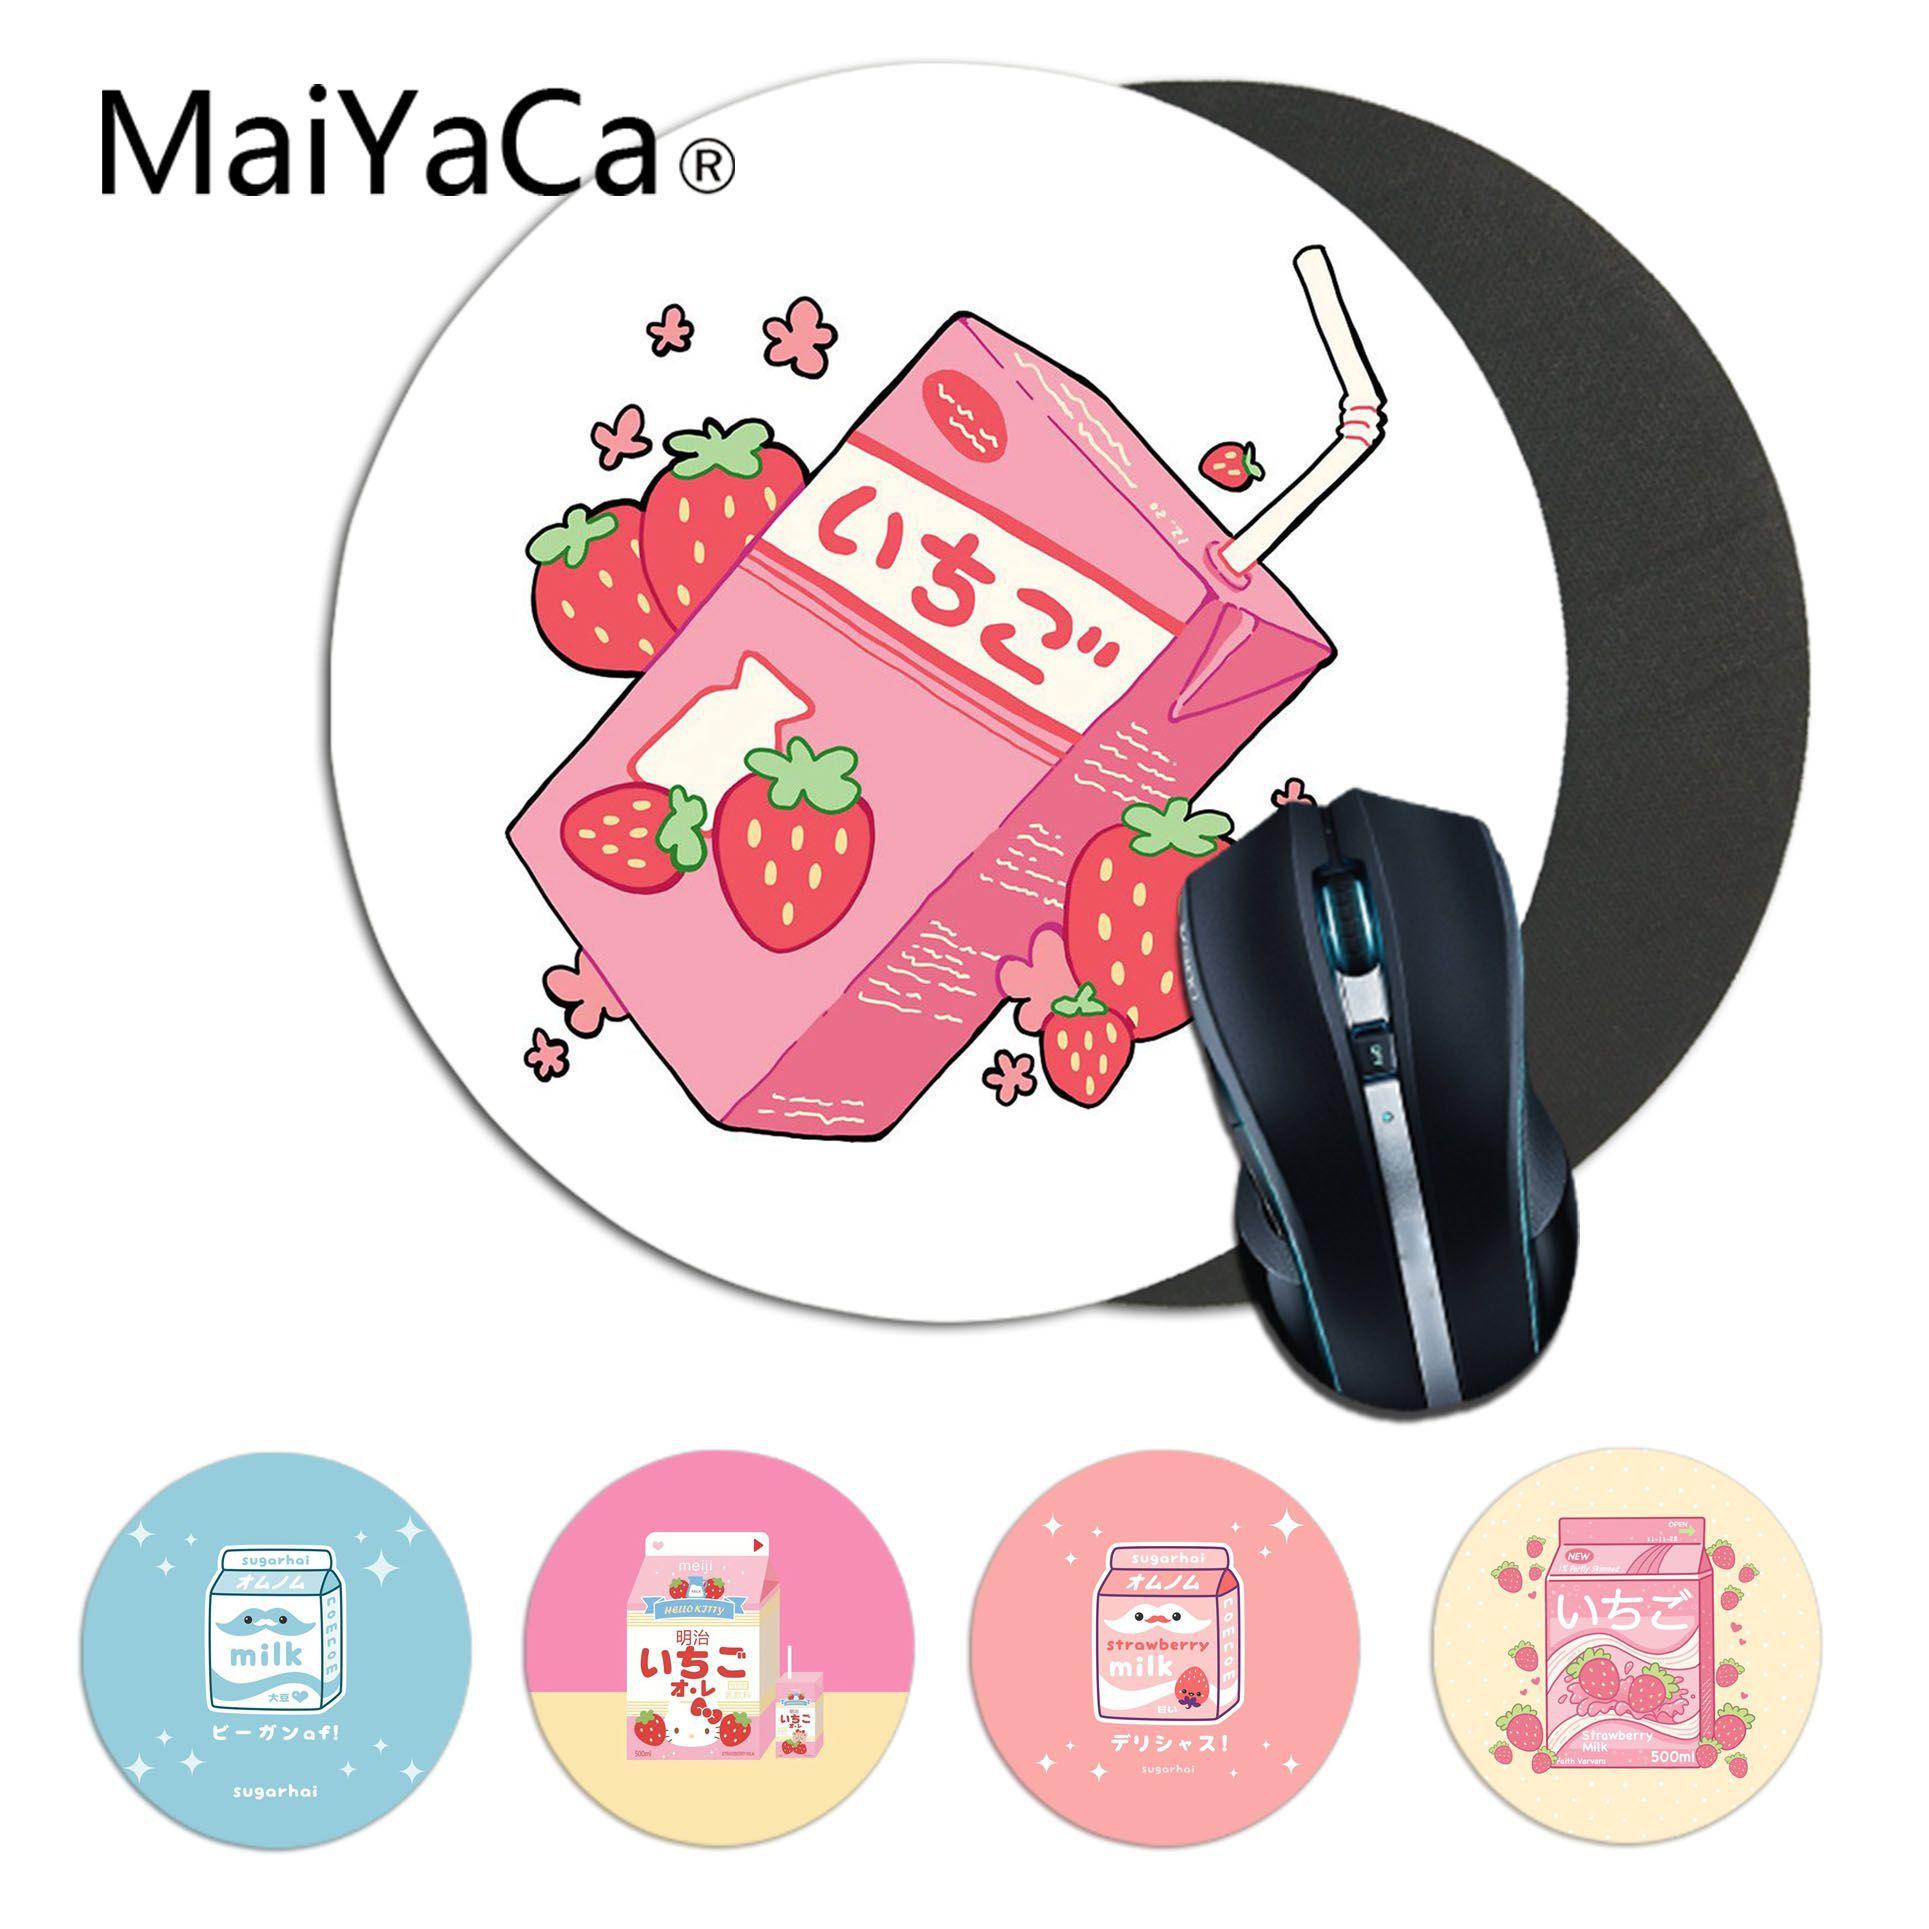 MaiYaCa Kawaii Japanese Strawberry Milk Pattern Rubber PC Computer Gaming Mousepad Rug For PC Laptop Notebook Gamer Desk Pad